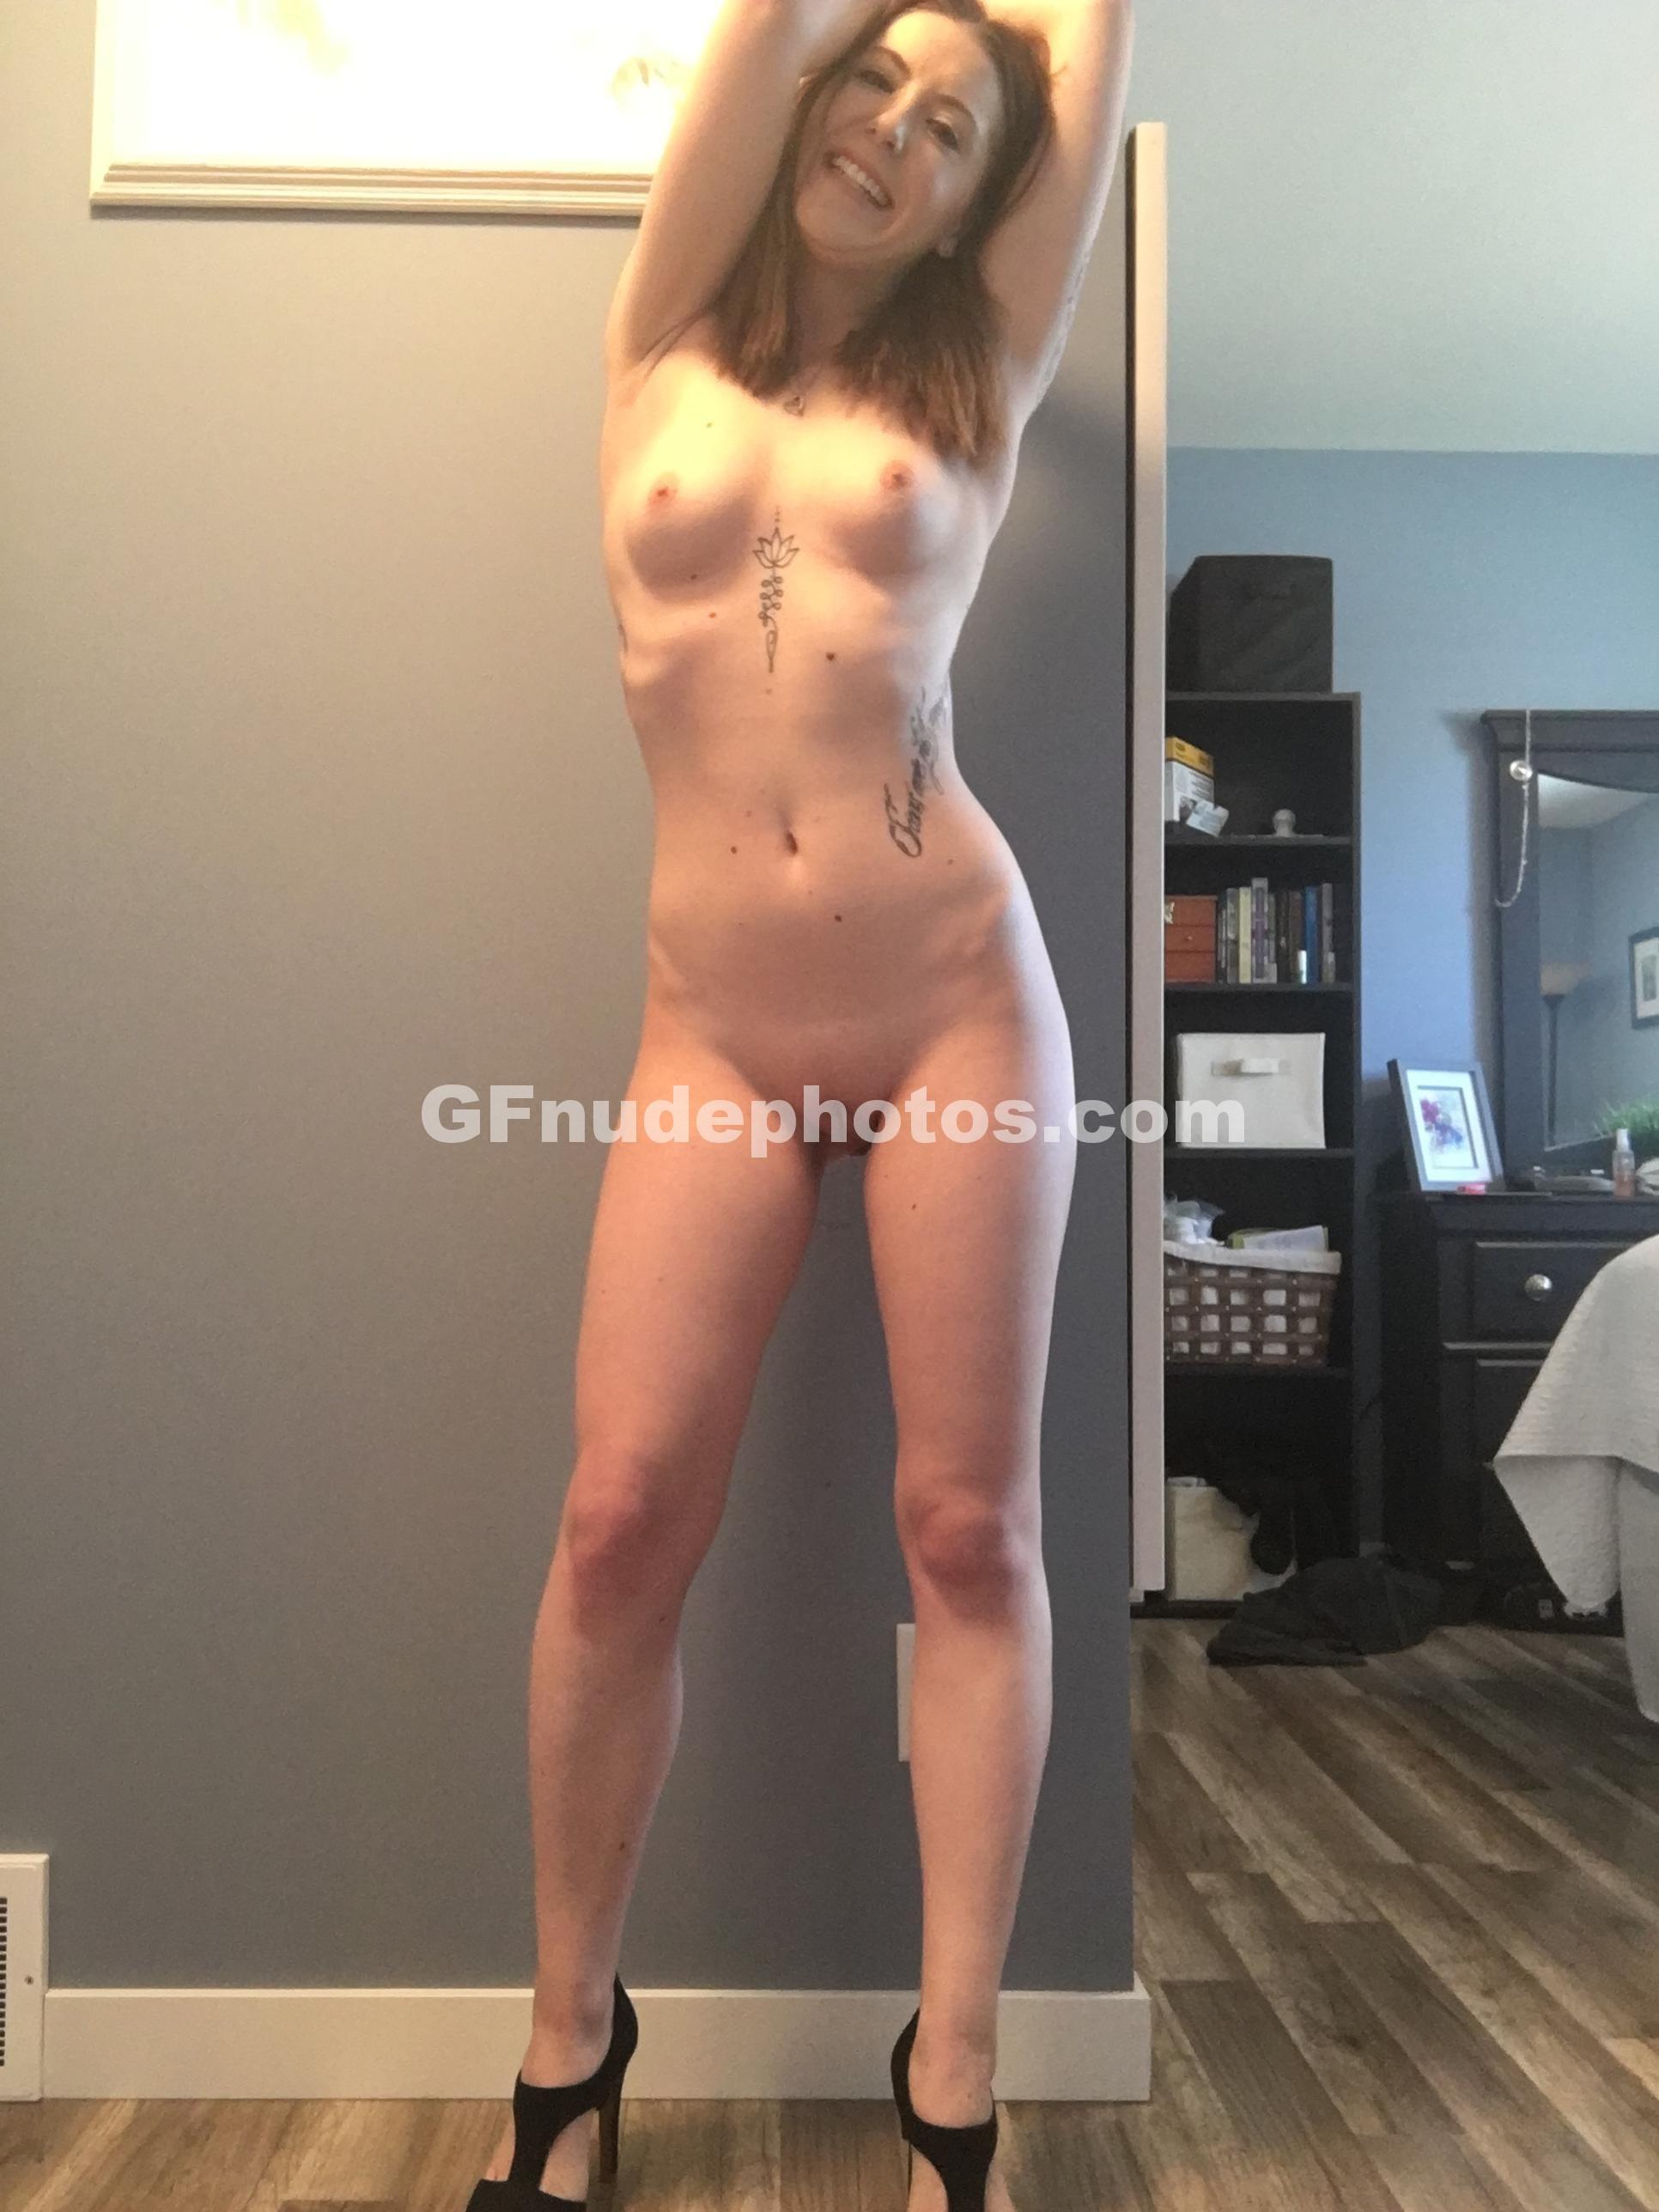 amateur exgf nude naked porn boobs pussy ass xxx pics – gfnudephotos